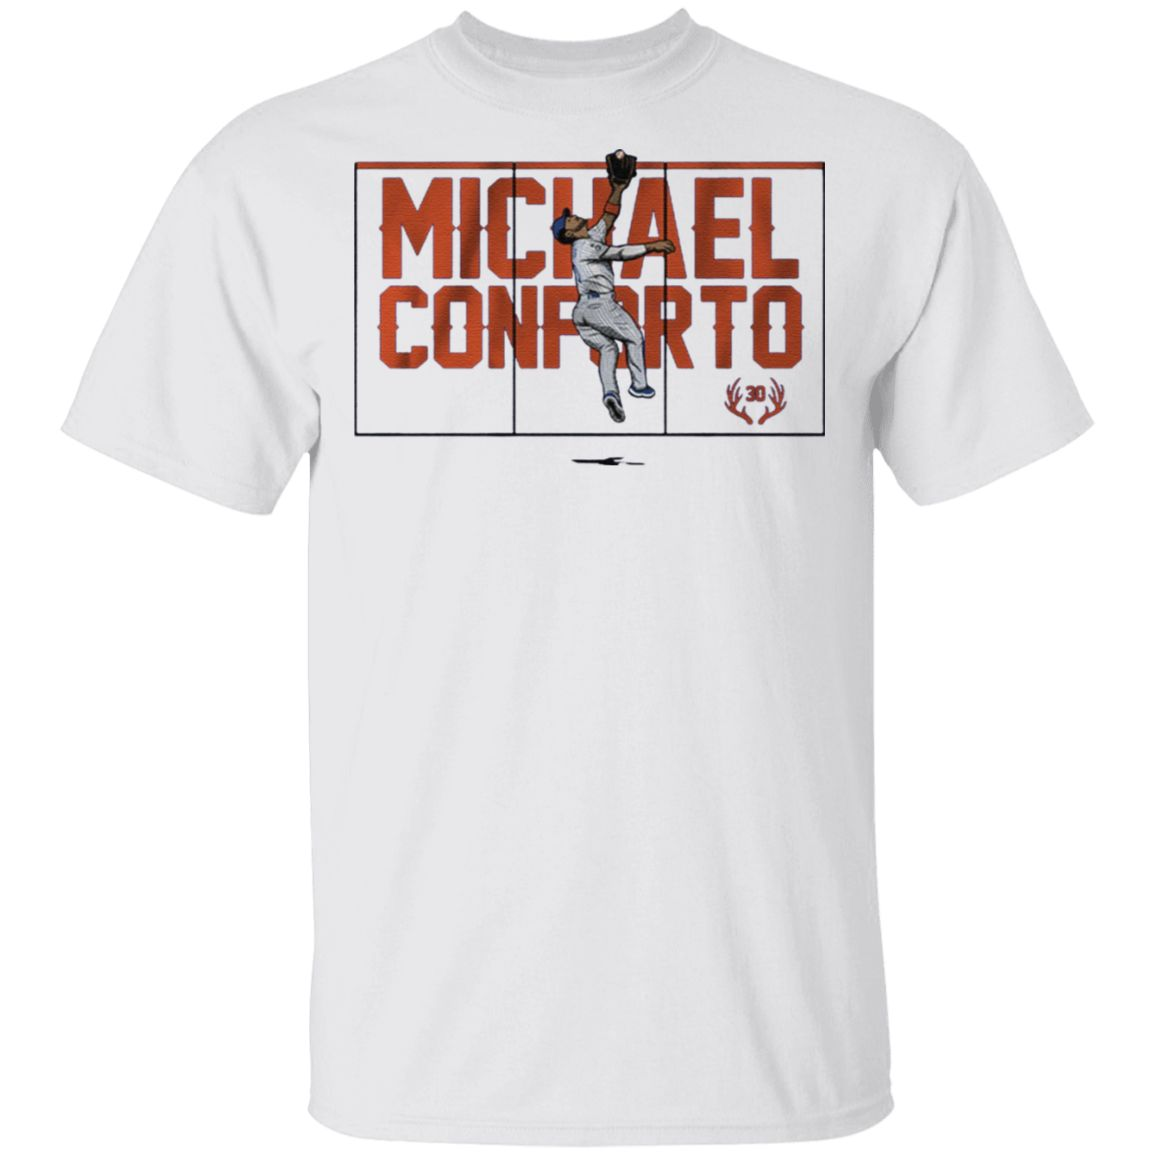 Michael Conforto T Shirt